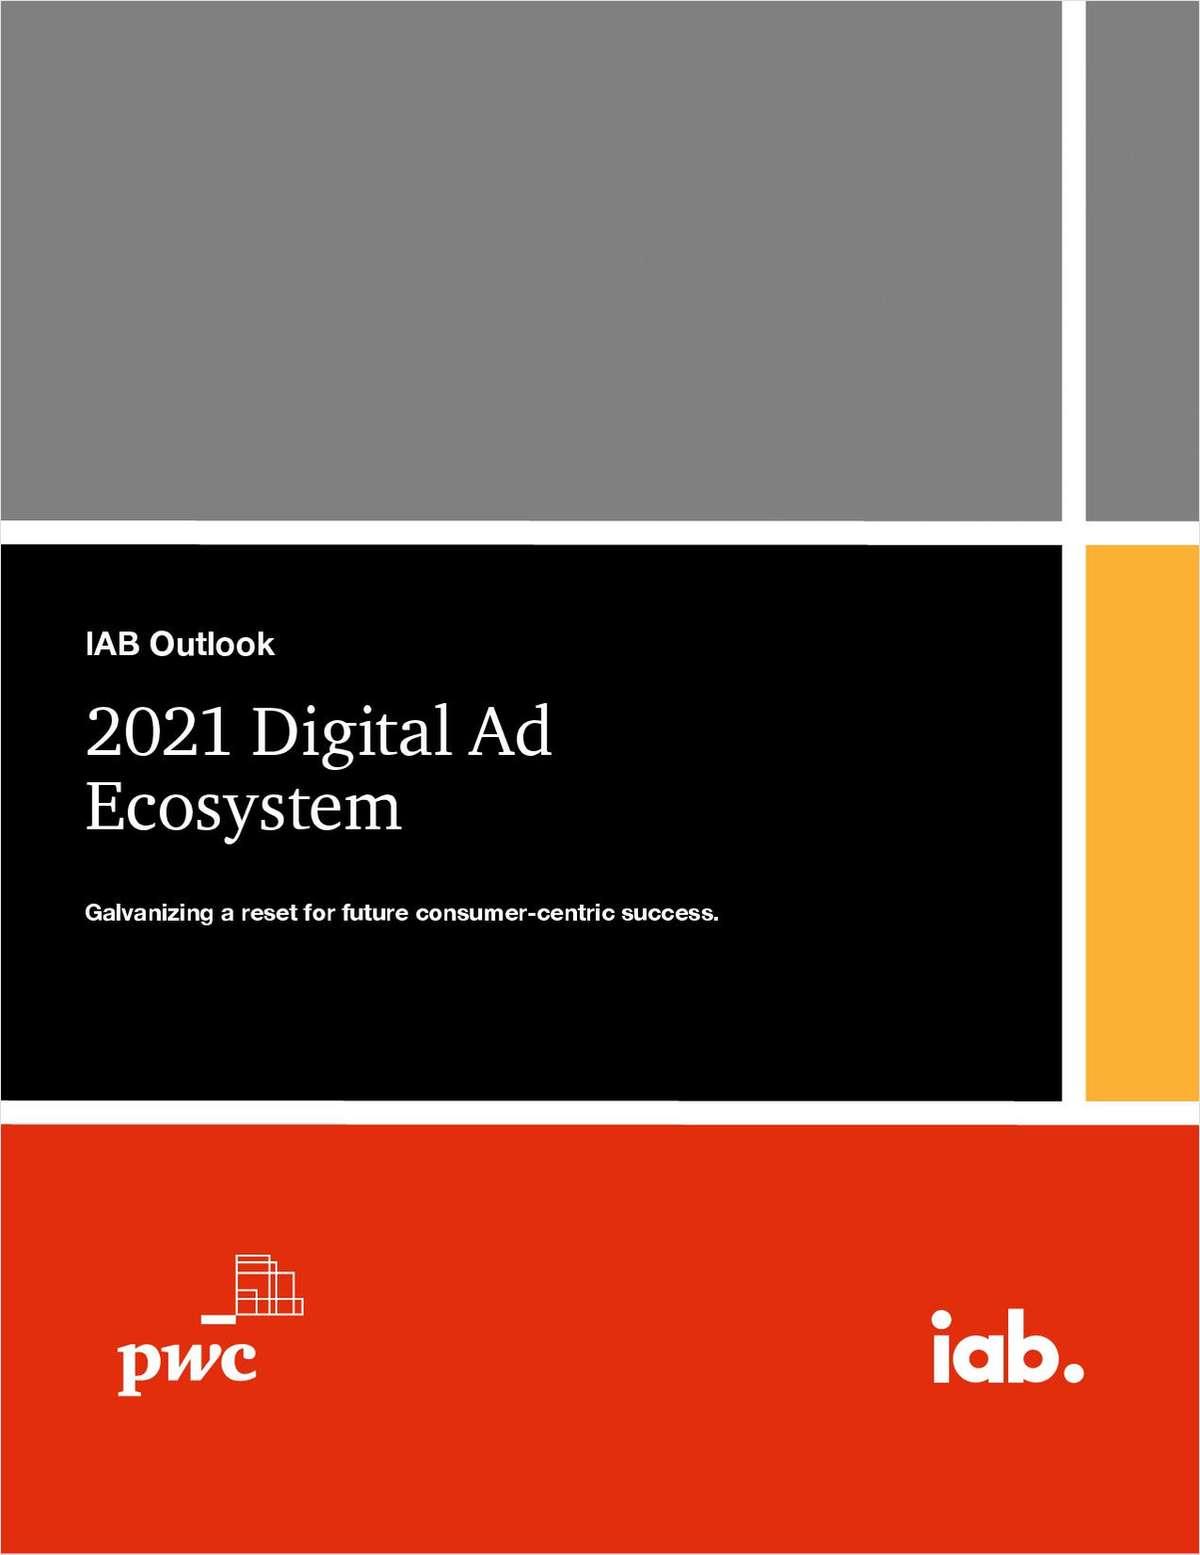 2021 Digital Ad Ecosystem